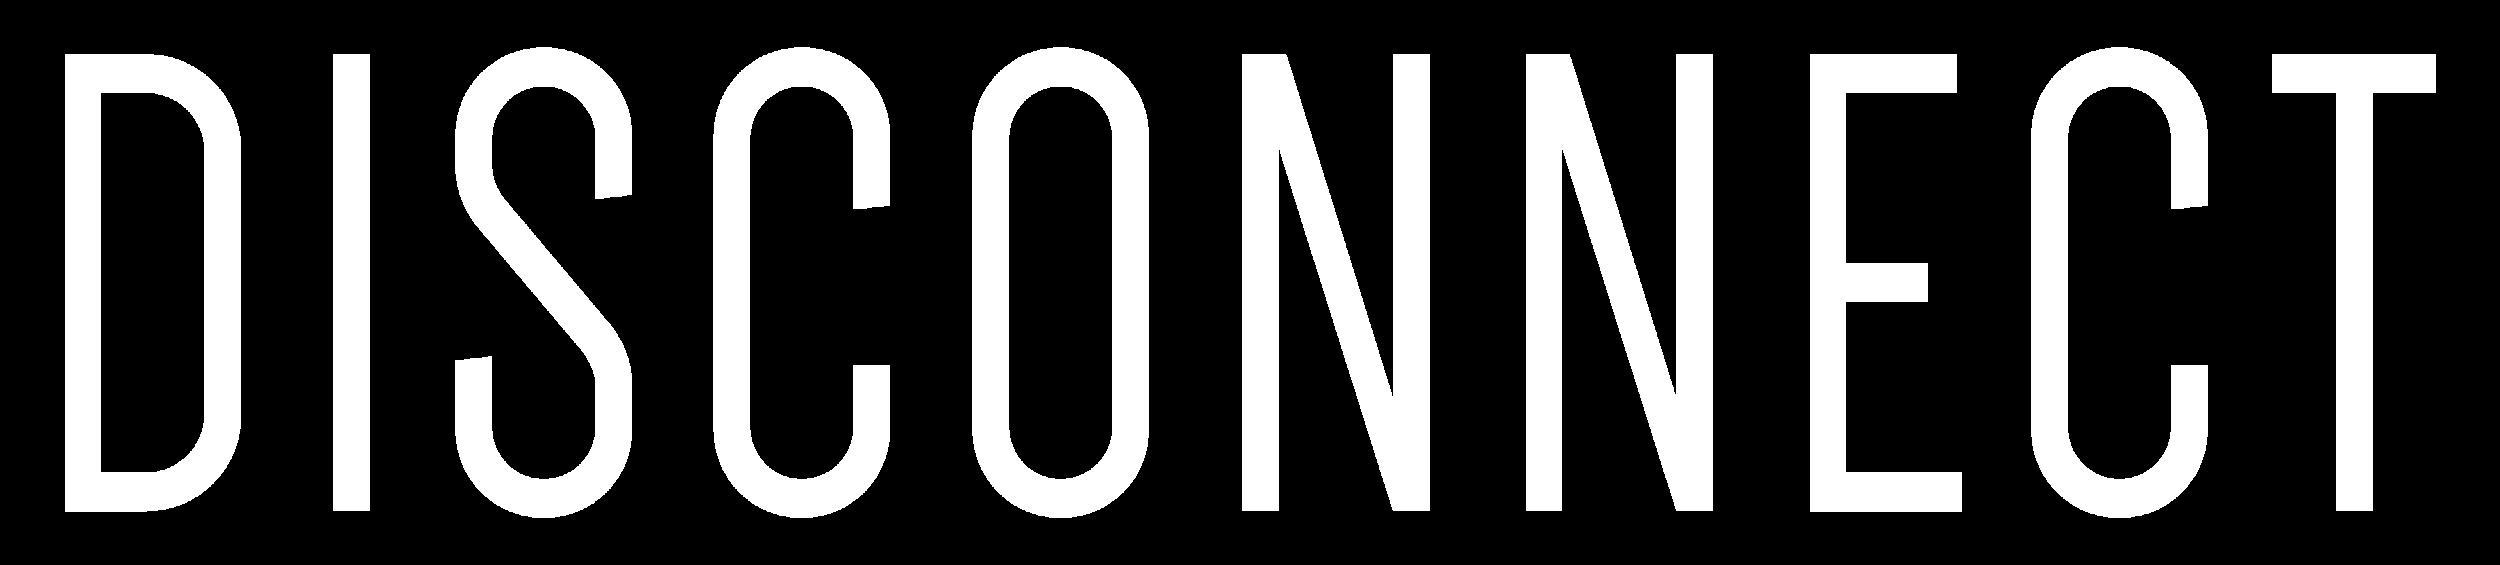 DISCONNECTTT.png